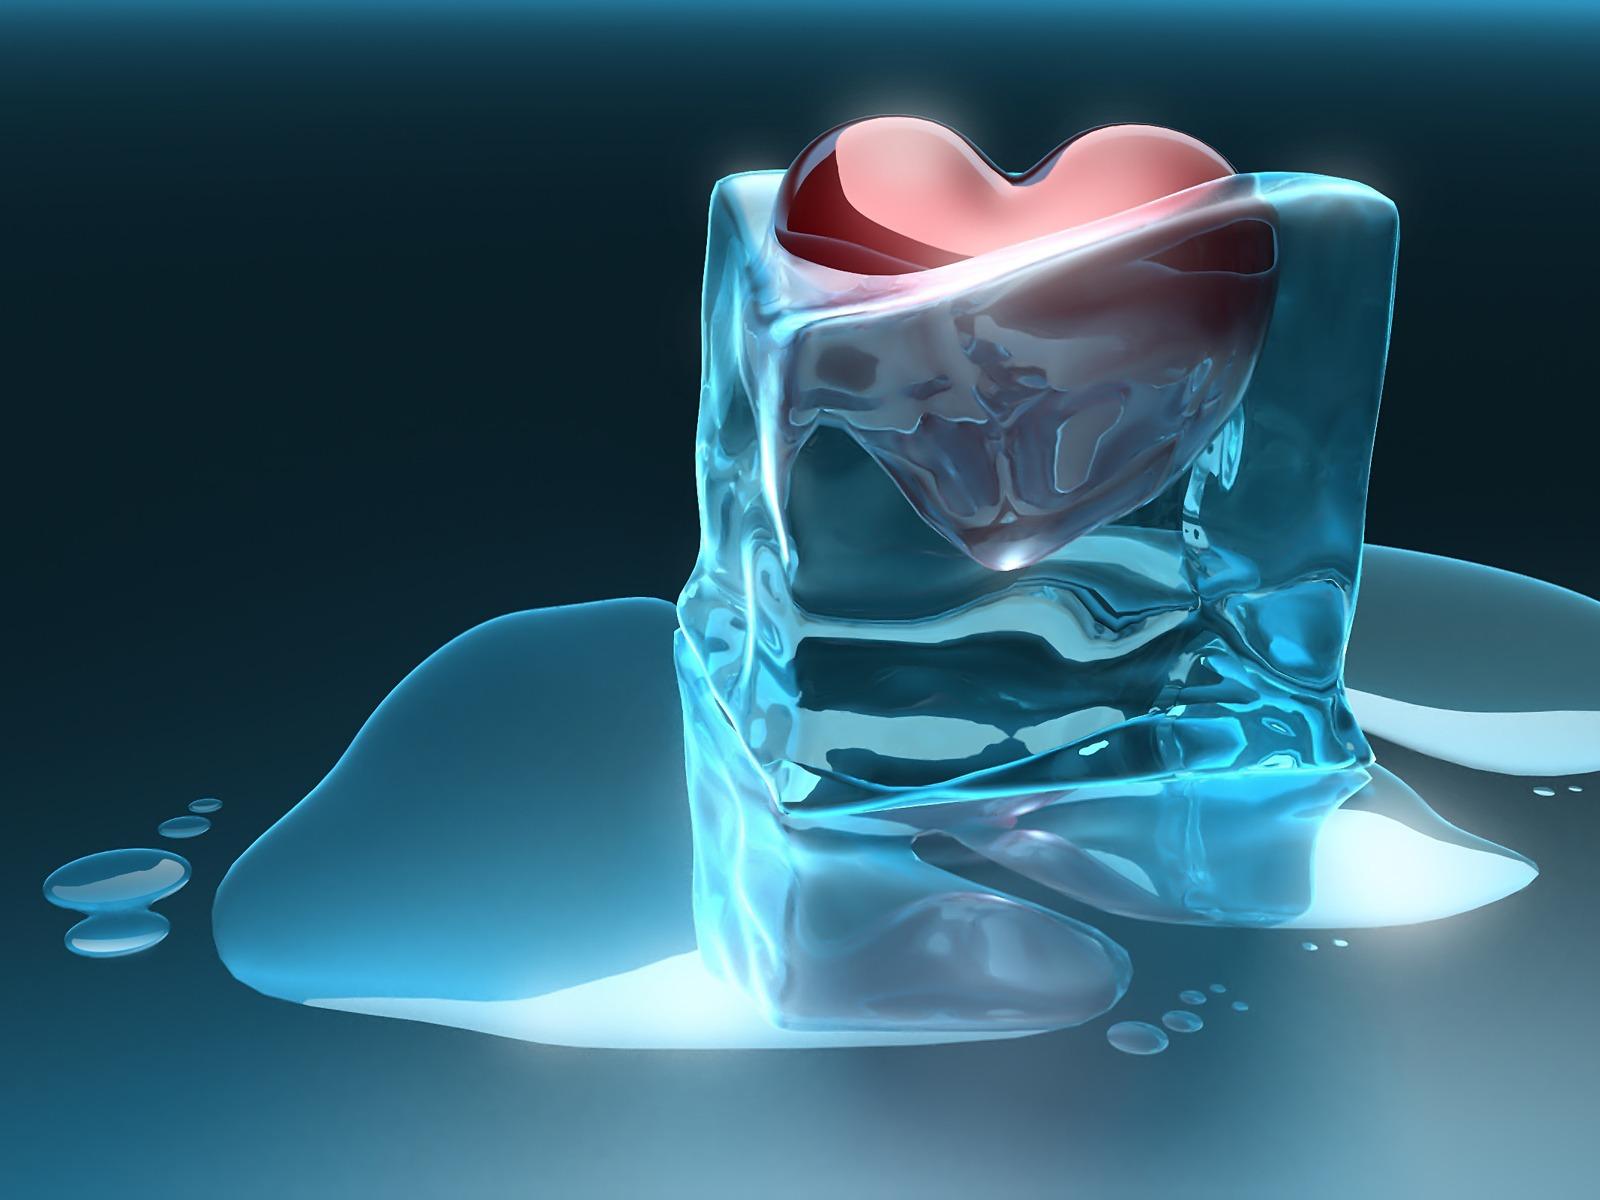 ice 3d wallpaper hd heart melting digital art crystals 1600x1200